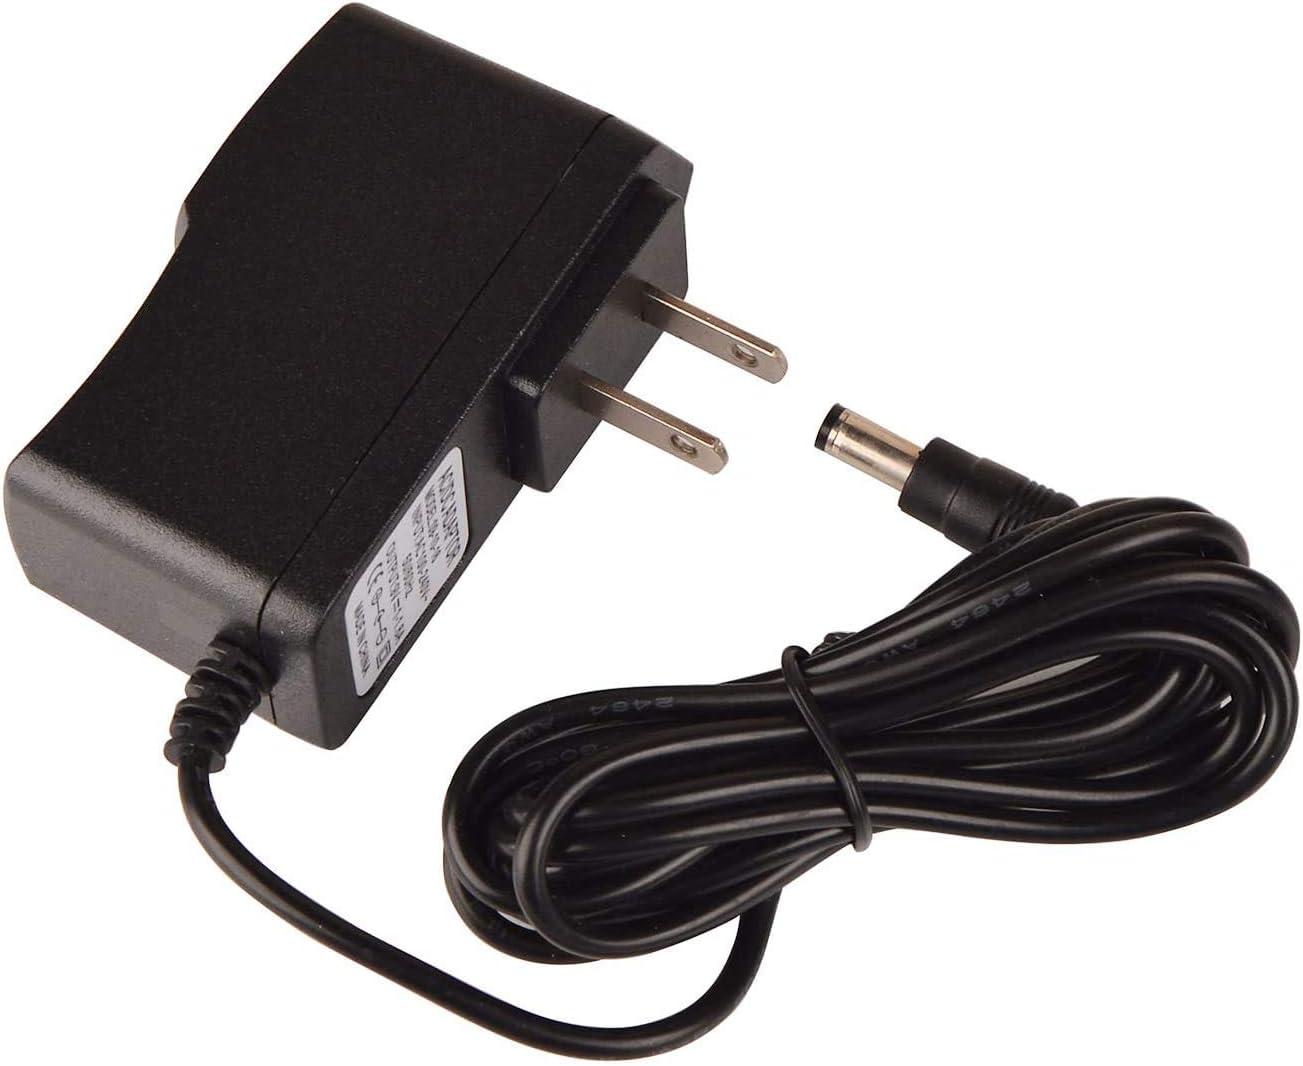 AC/DC Adapter - DC 12V 1A Power Supply 1000mA, 100~240V AC to DC 12 Volt 1 Amp 0.6A Converter with 5.5 x 2.5mm 2.1mm Plug for Security Camera DVR NVR Surveillance System